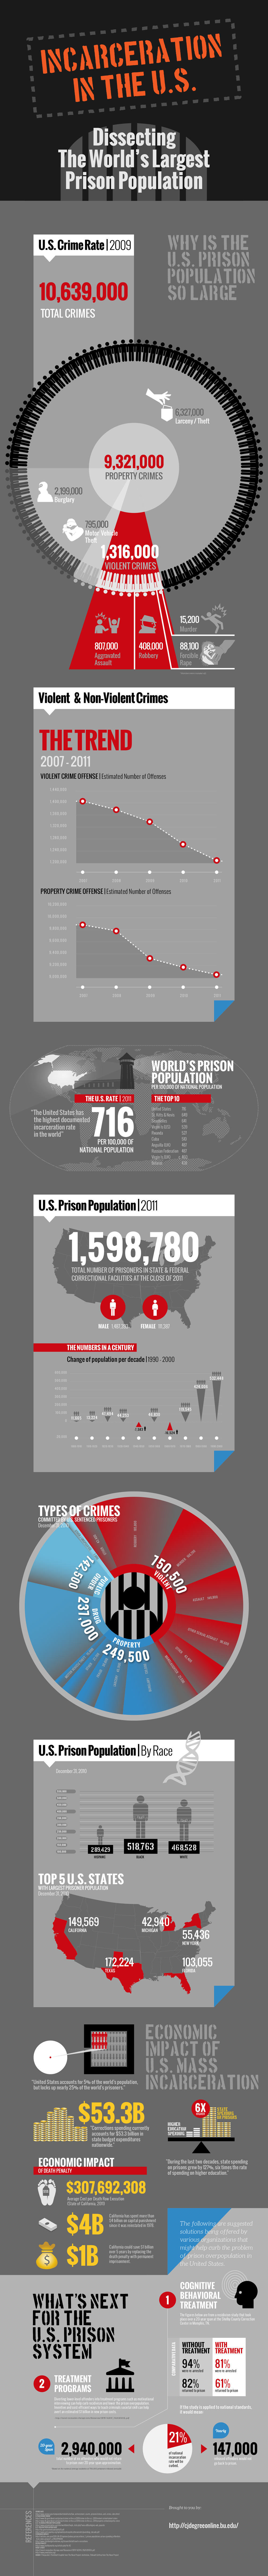 Prison Population Of US